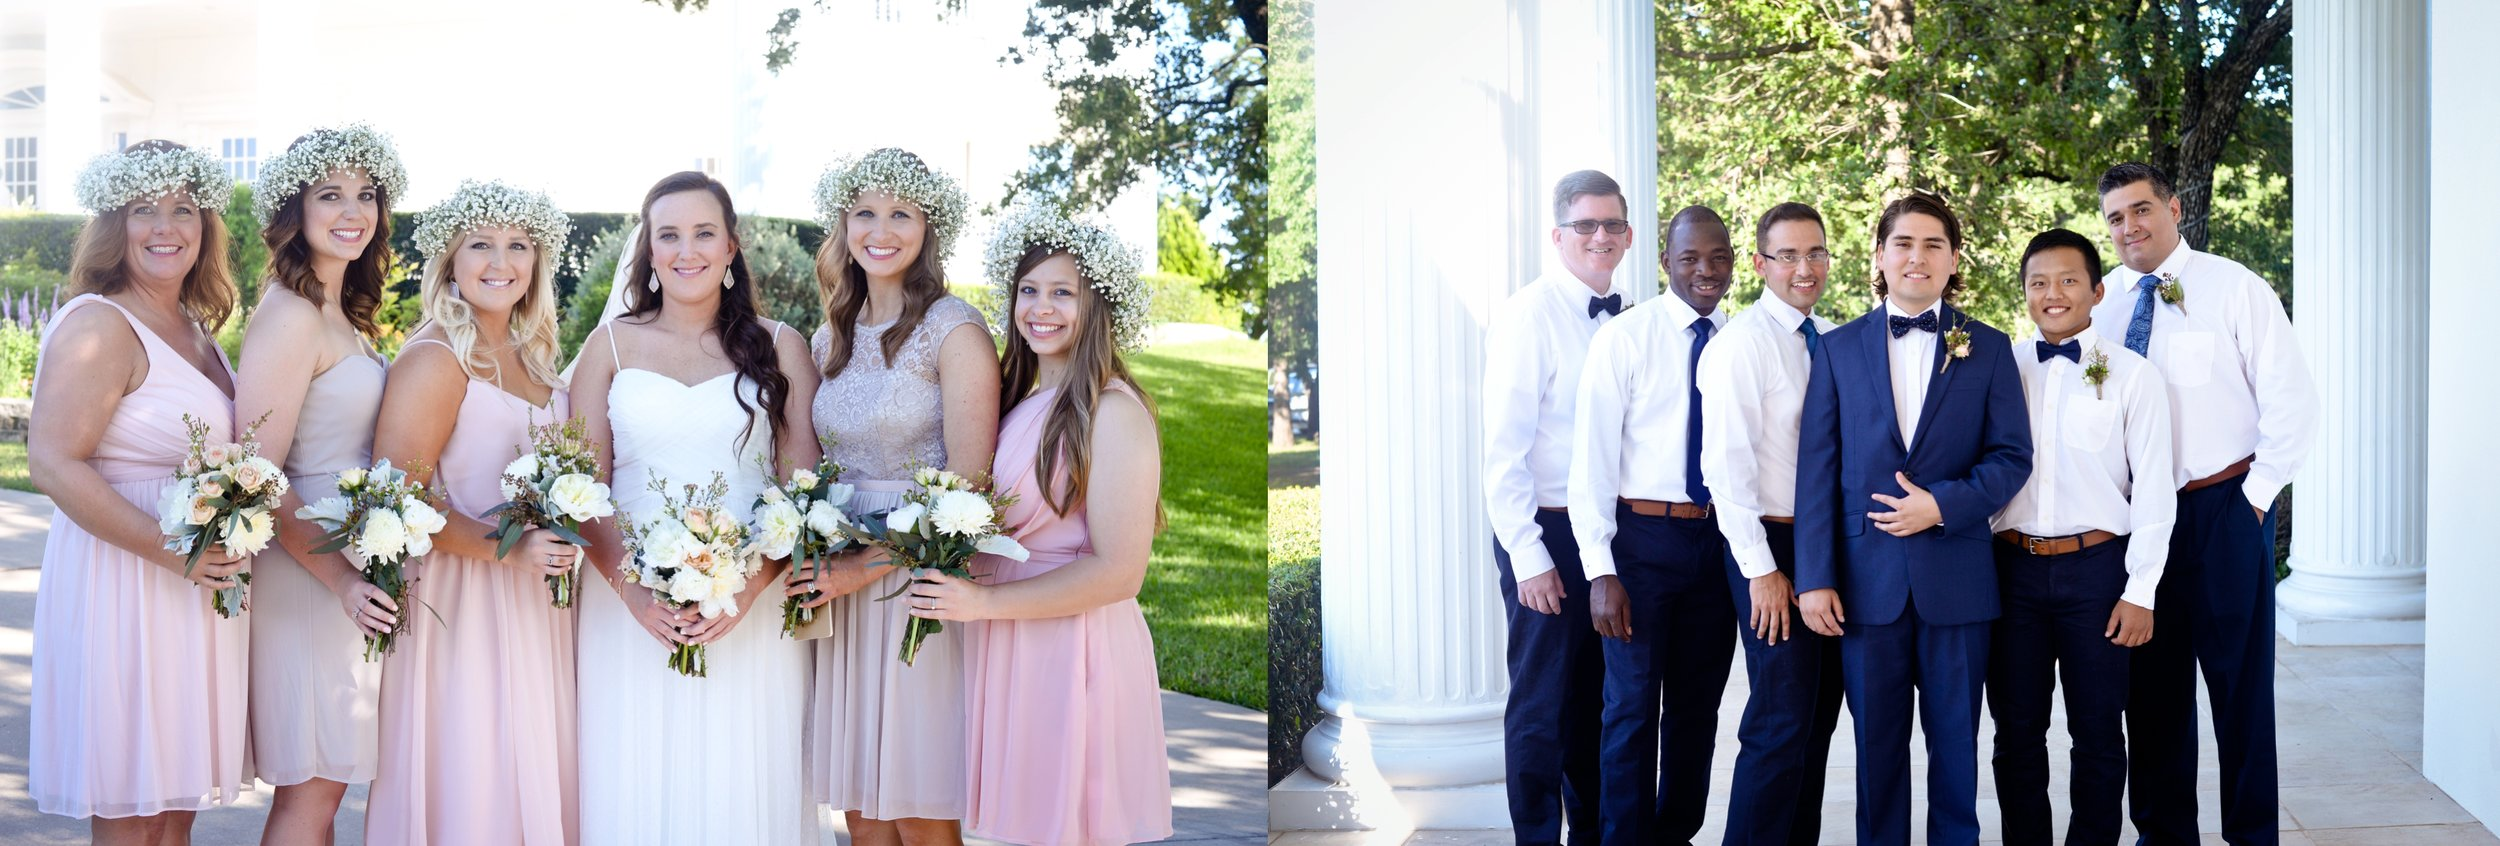 Lonestar-Mansion-Fort-Worth-Wedding-Planner-Burleson-Wedding-Venue_13.jpg